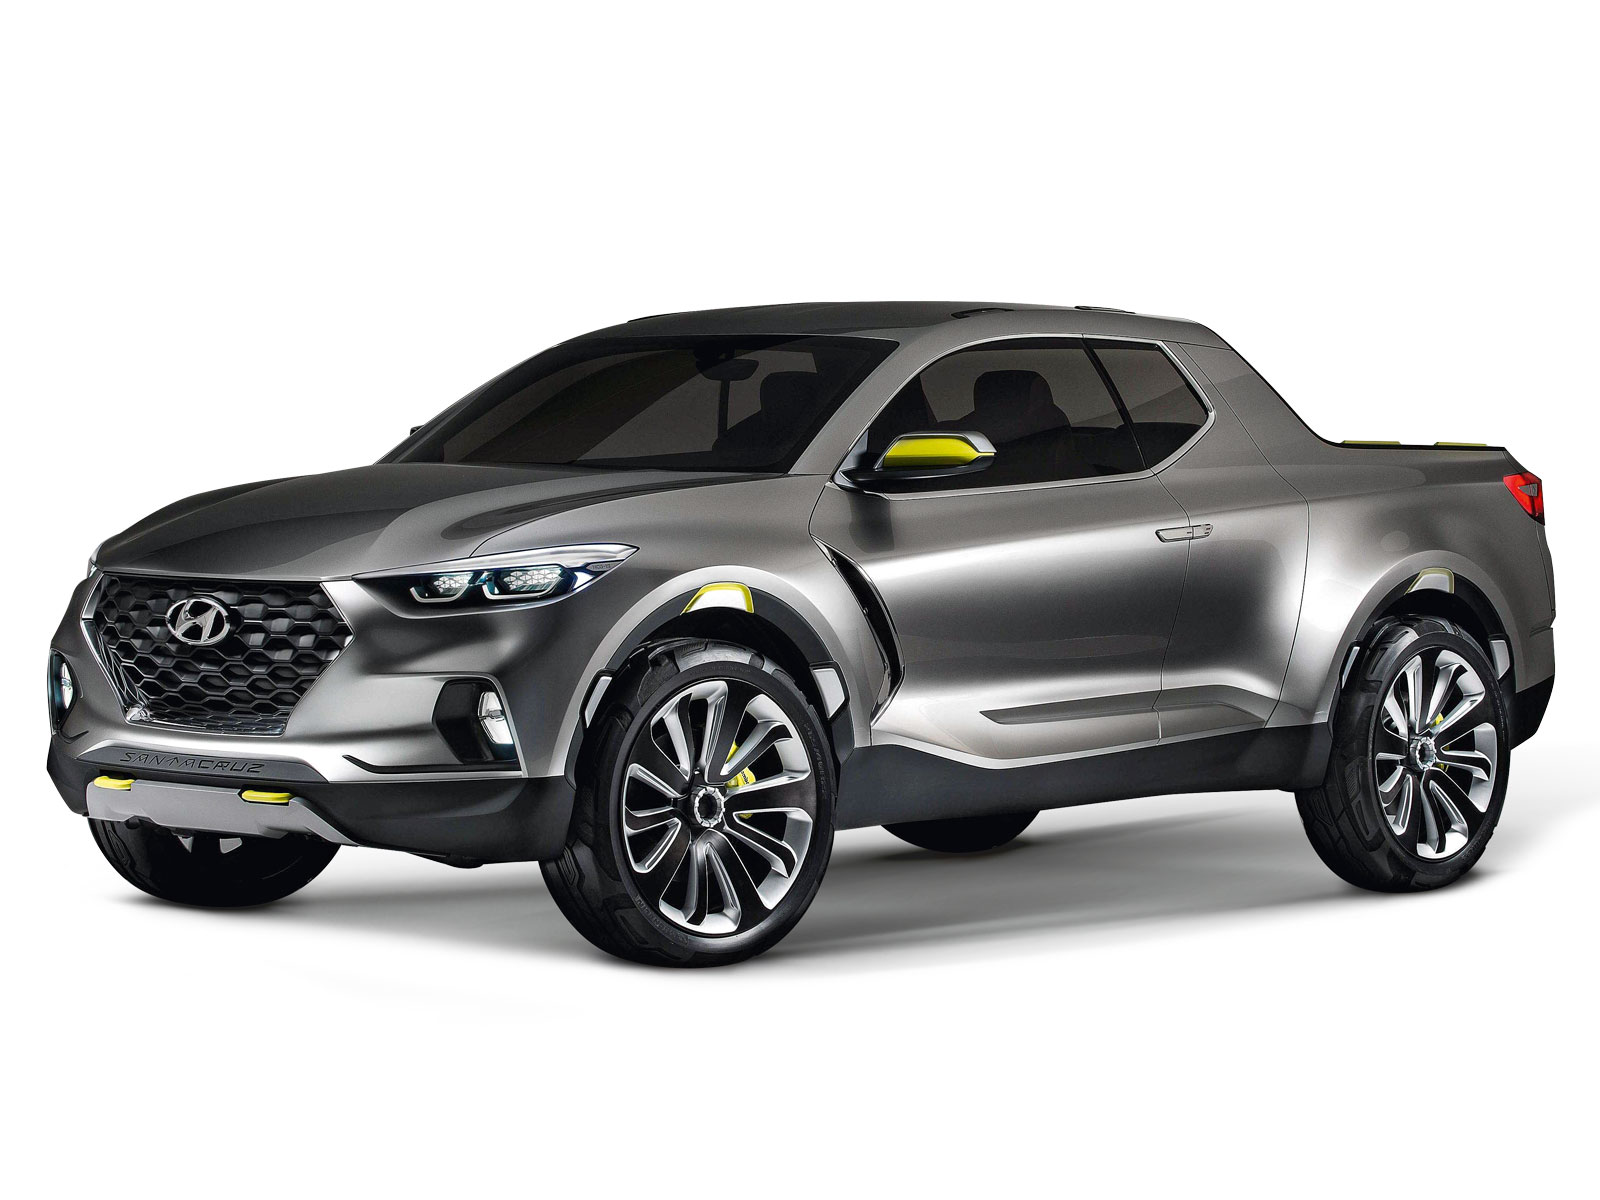 Picape Hyundai